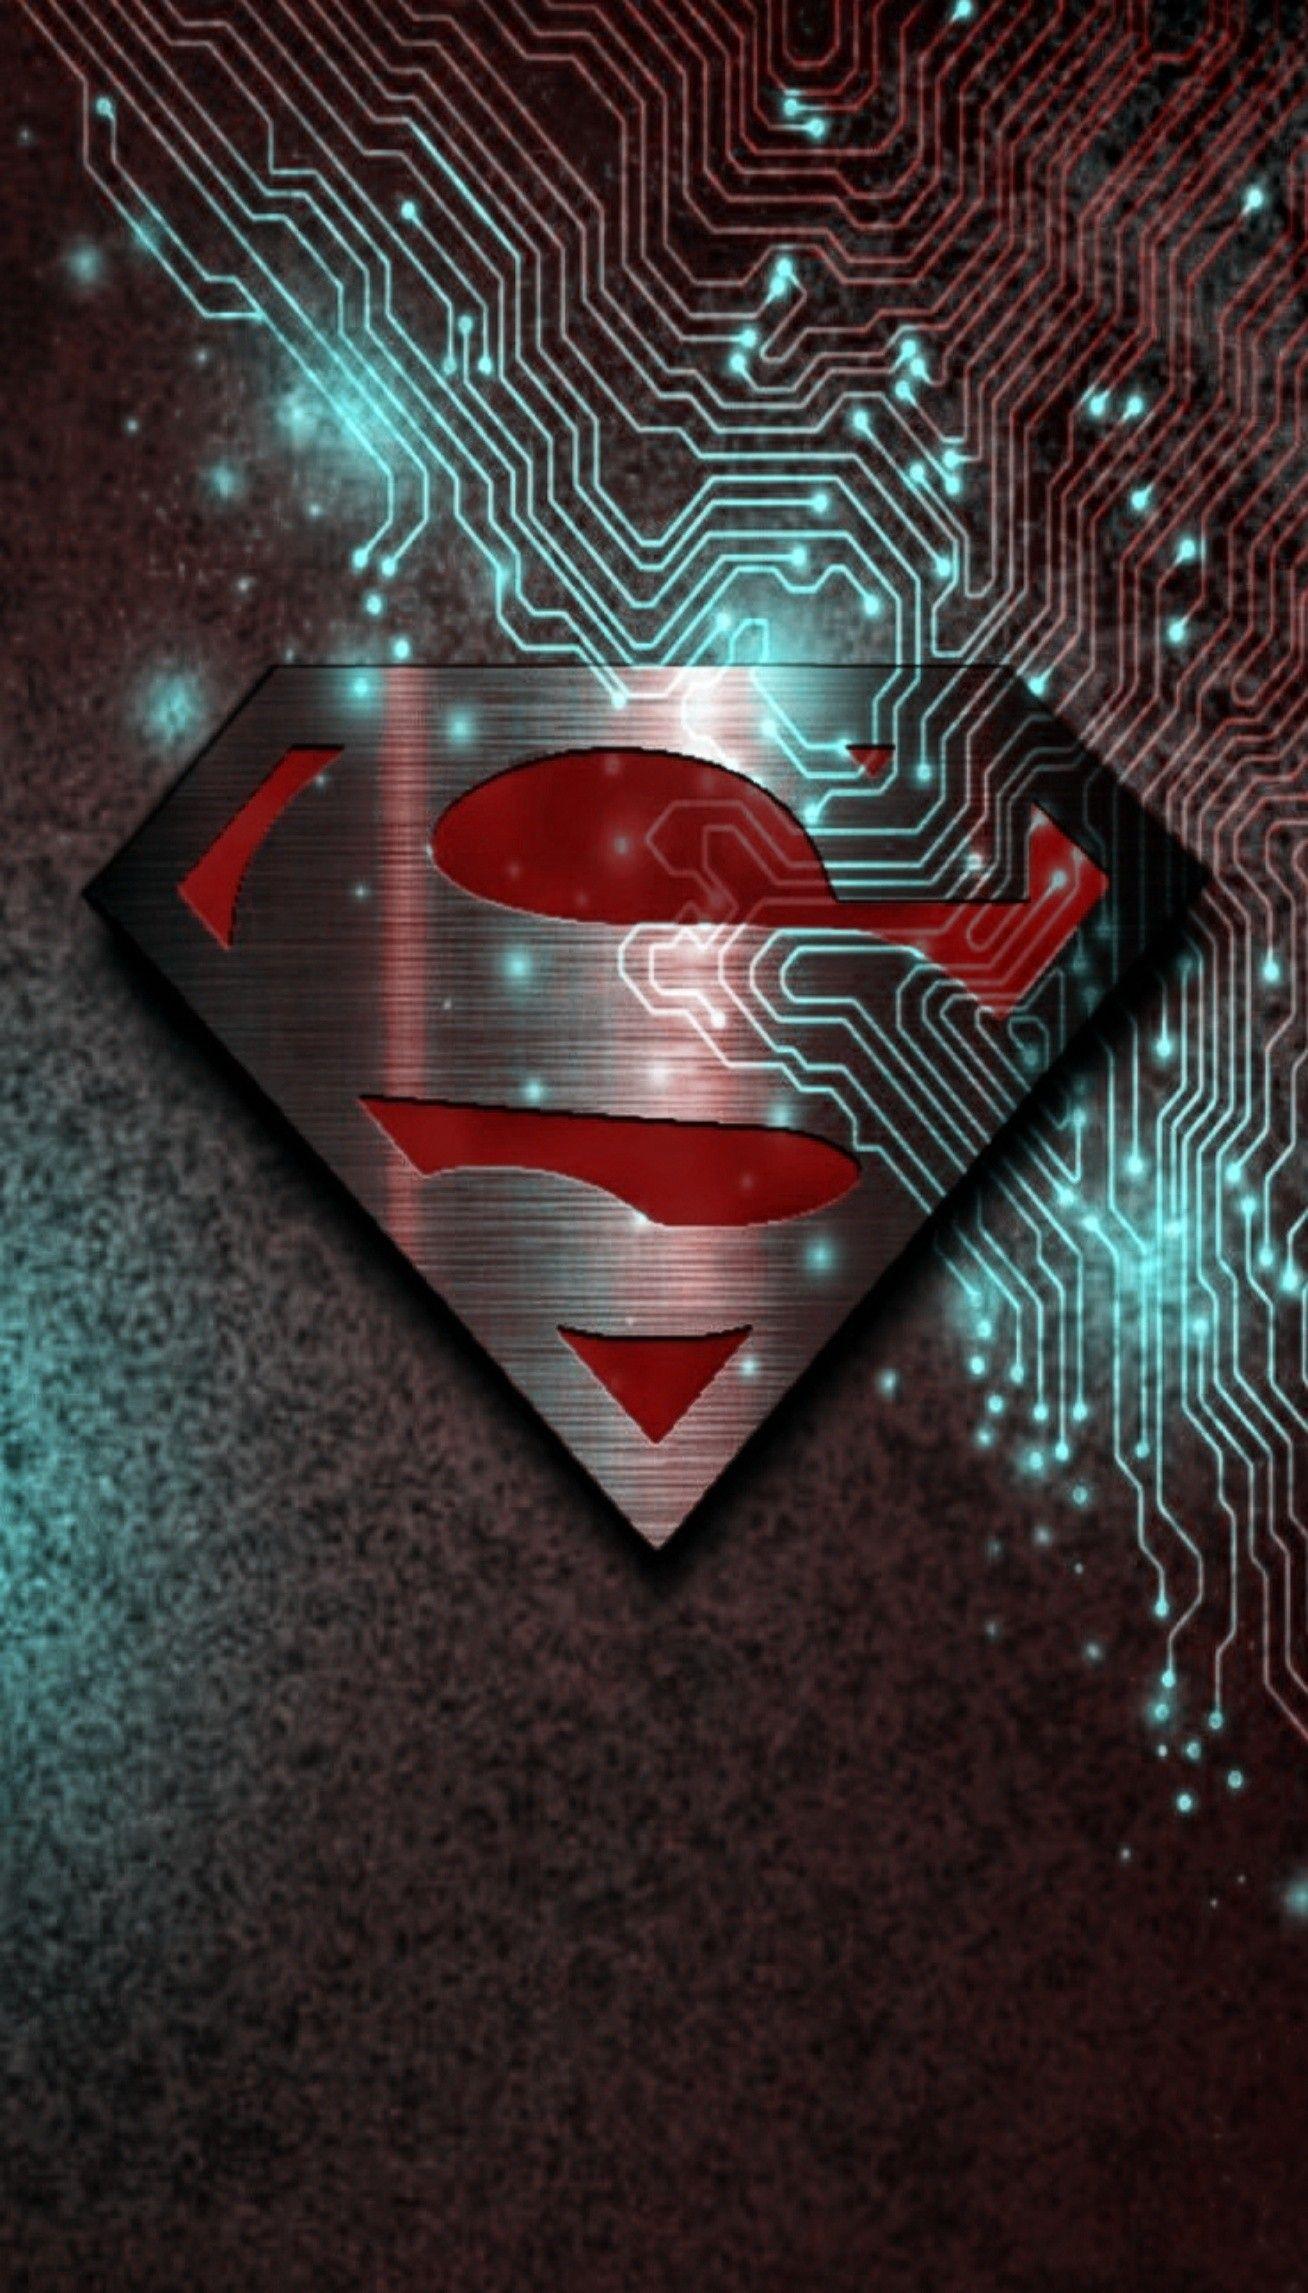 Pin By Araf Hasan On Pic Superman Artwork Superman Symbol Superman Wallpaper